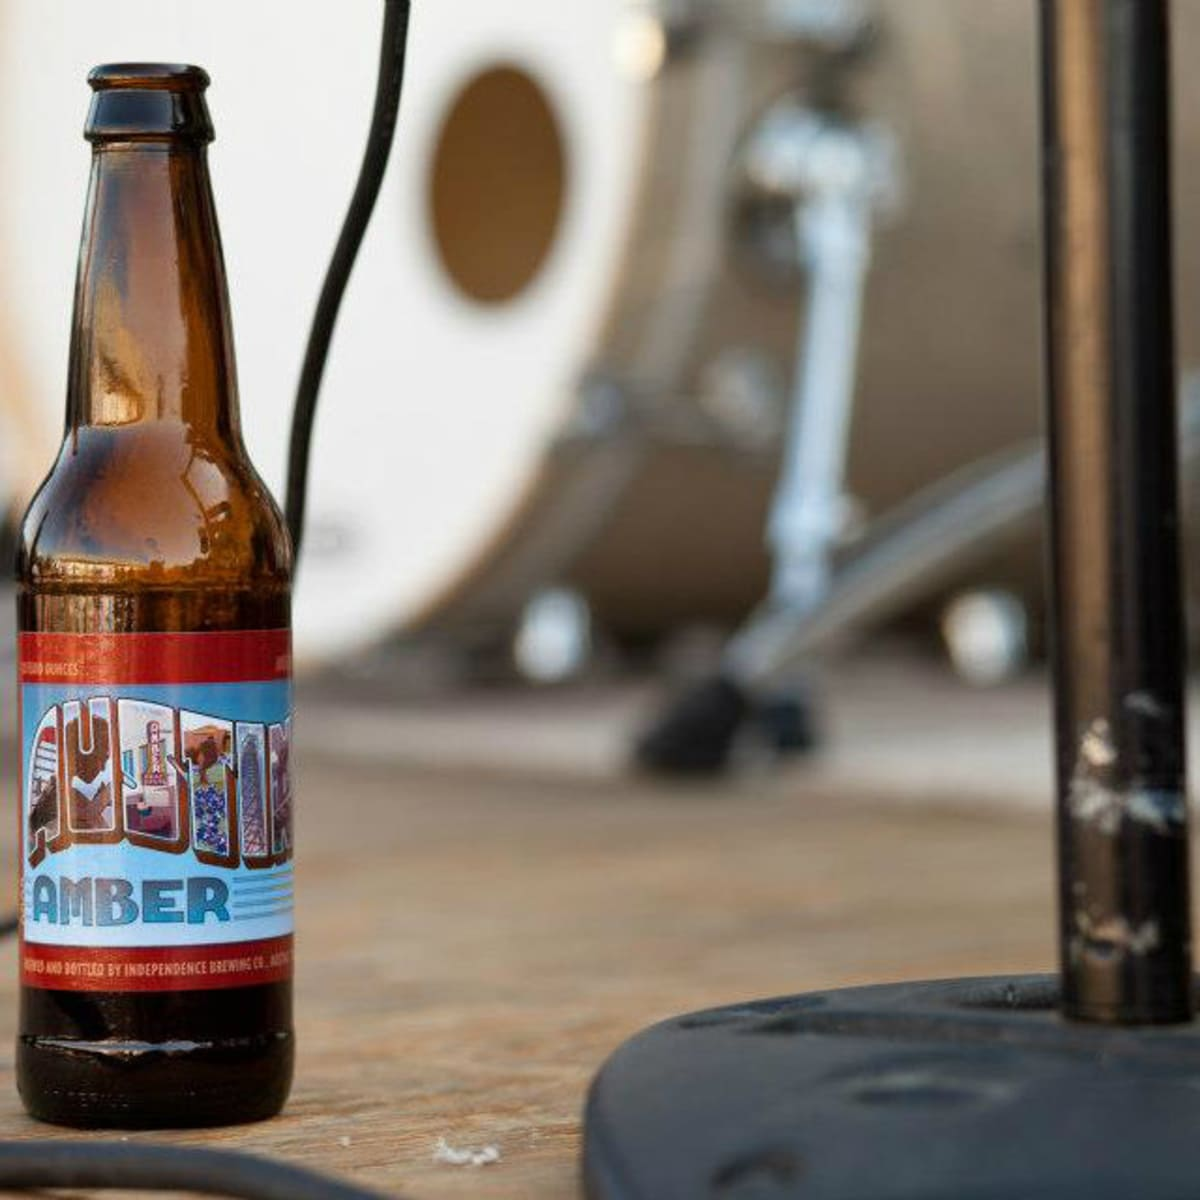 beer bottle of Independence Brewing Co. Austin Amber